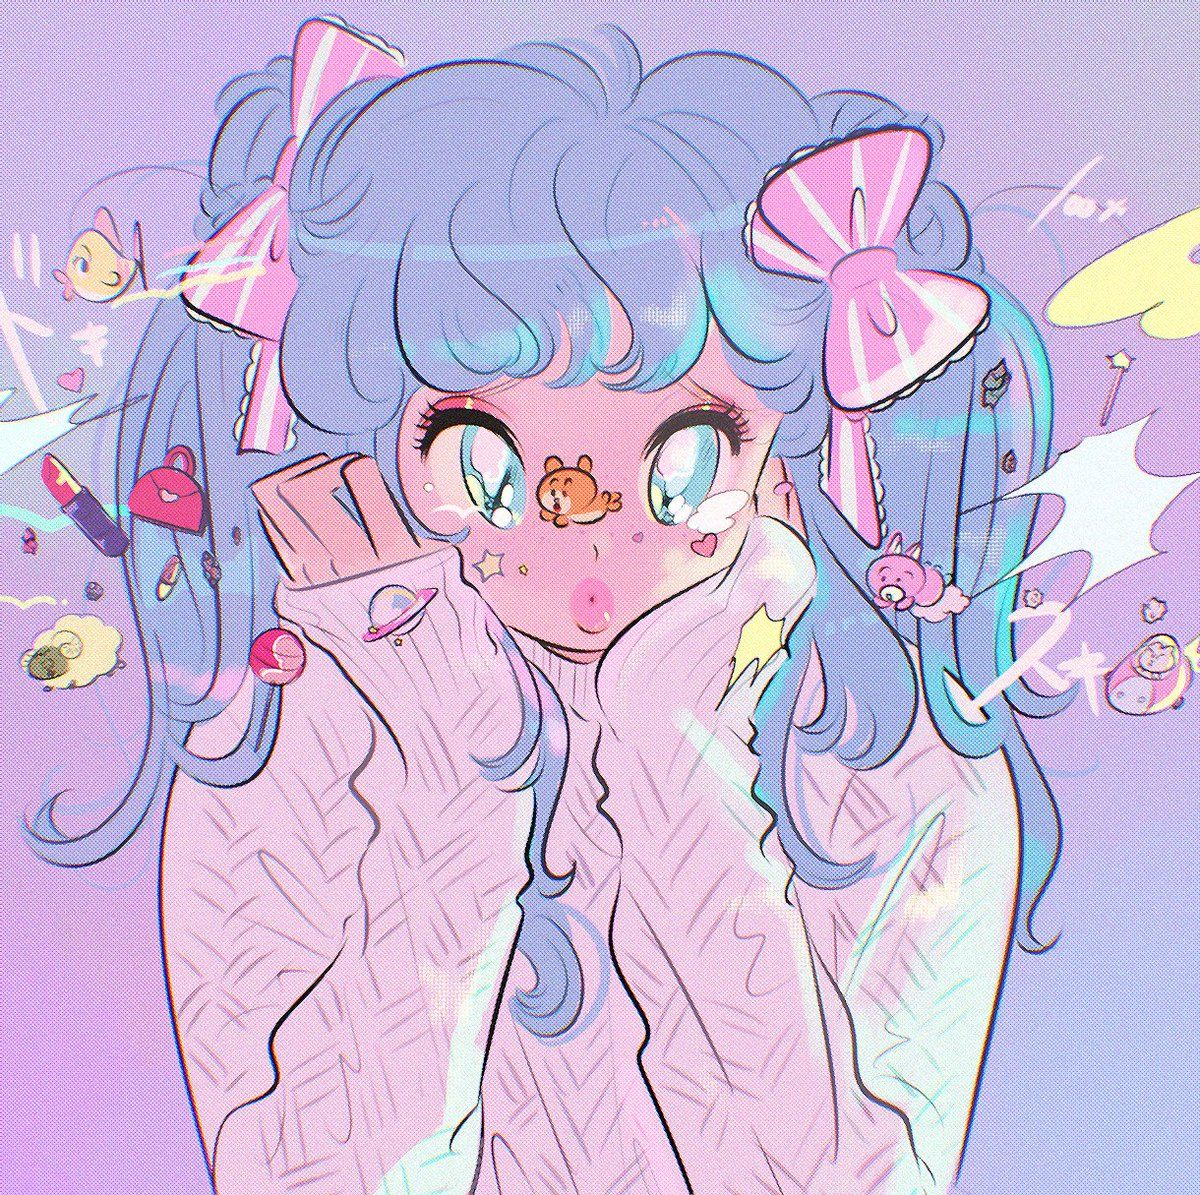 ᴰʳ.ᴍᴏʀɪᴄᴋʏ on in 2020 Aesthetic anime, Cute art styles